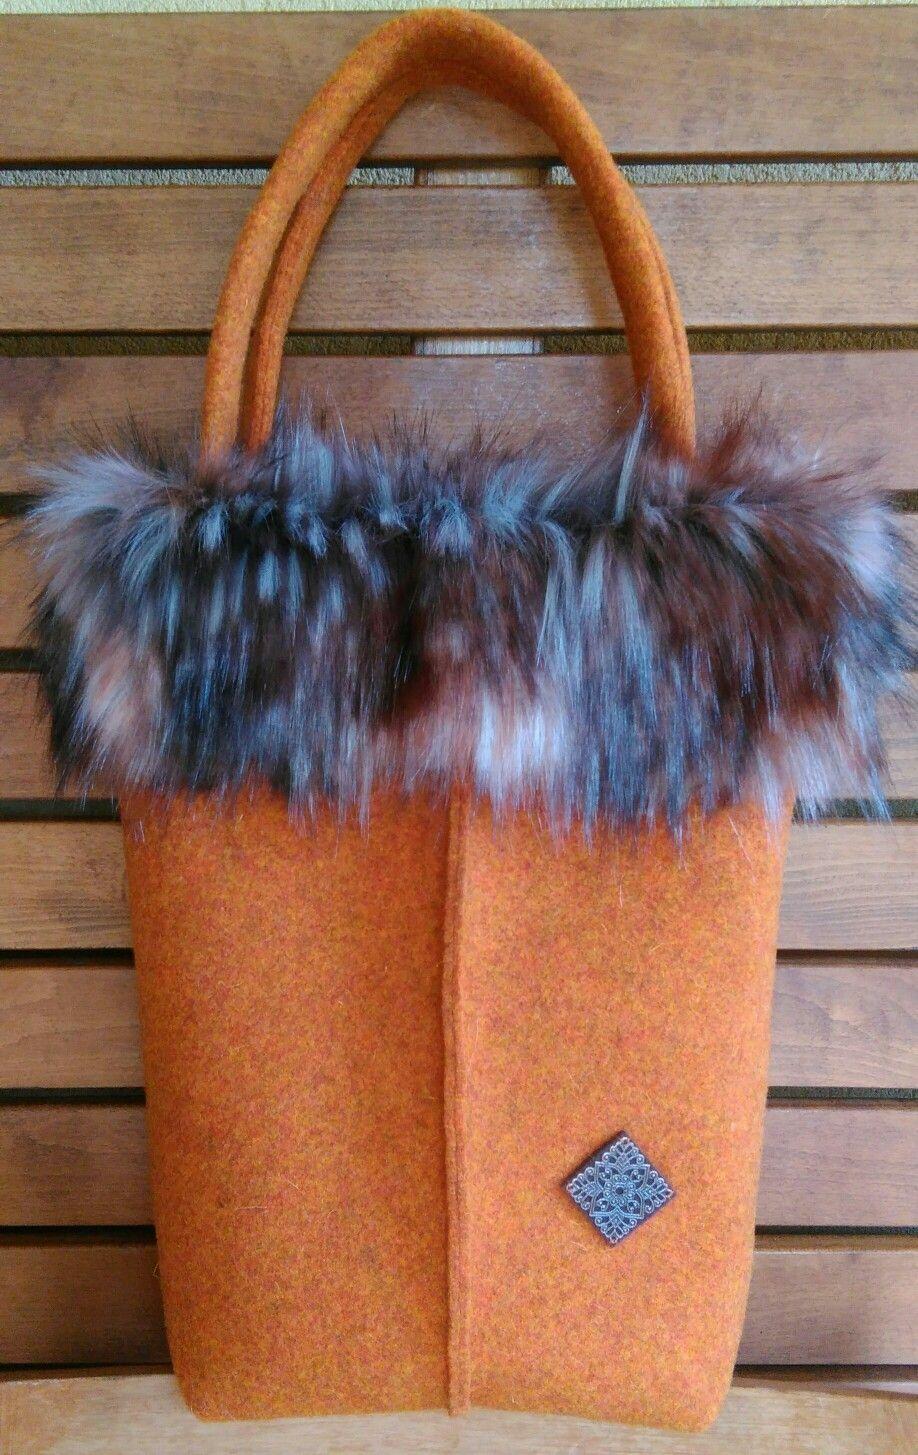 7a016307d1 Borsa feltro di lana con bordo in pelliccia ecologica. Foderata. Info  mariateresa.guidolin